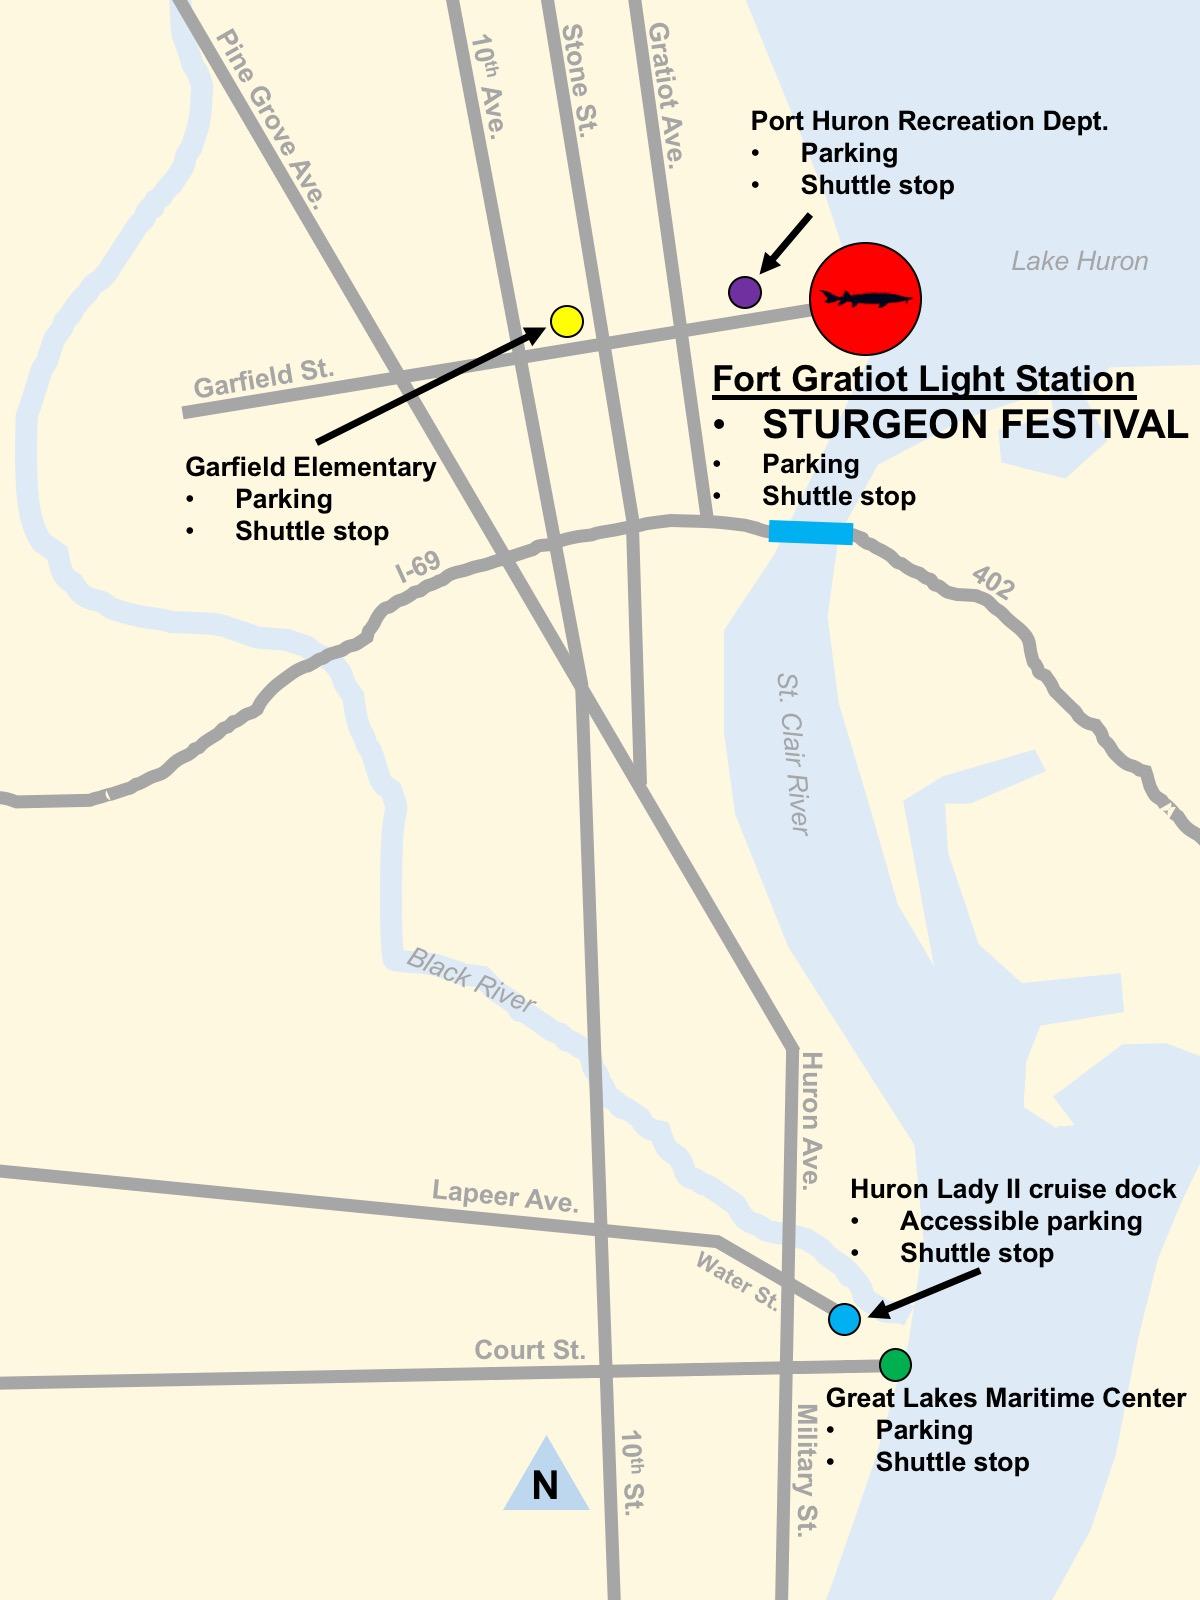 2019 Blue Water Sturgeon Festival